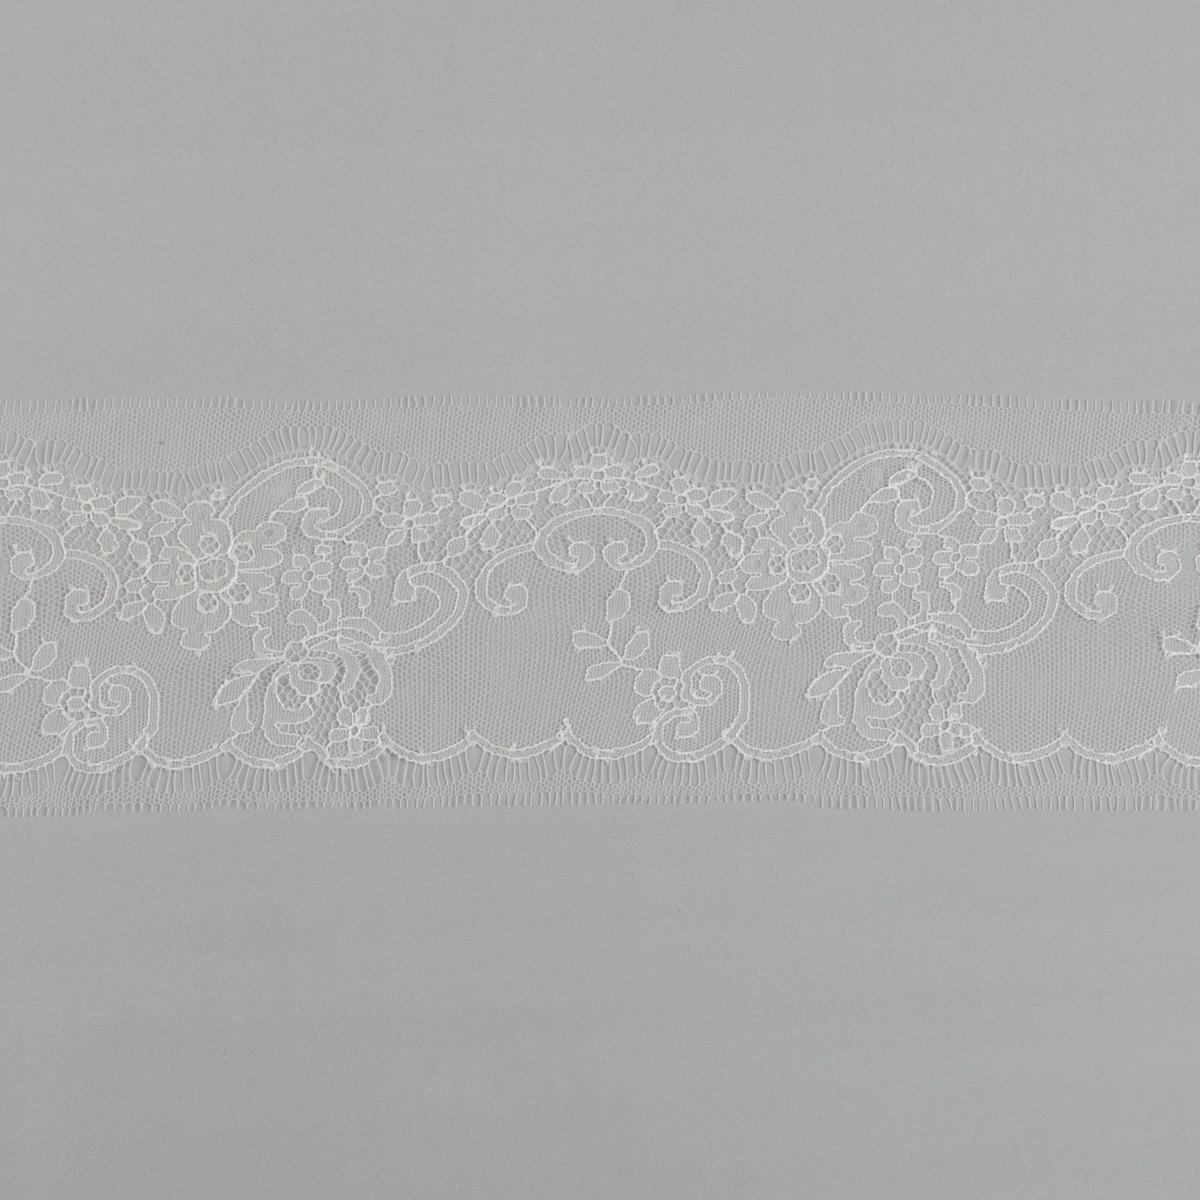 "Ажурное кружево ""Шантильи"" от Sophie Hallette цвета экрю"